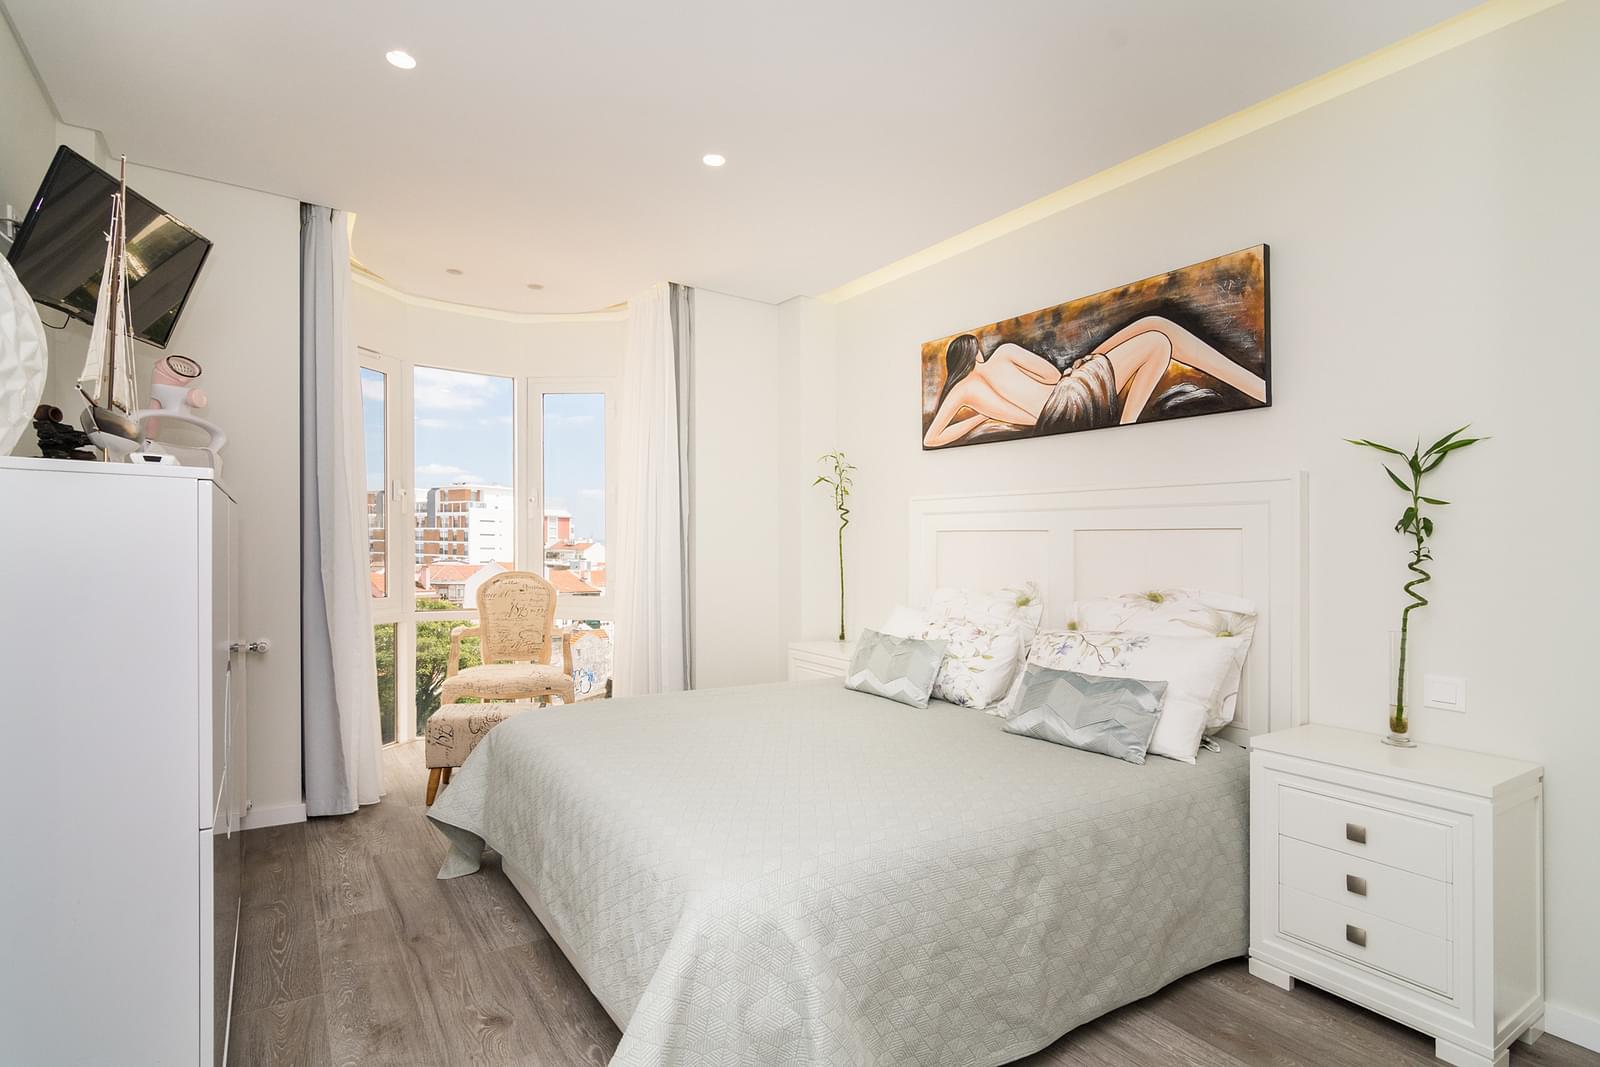 pf17479-apartamento-t4-lisboa-3f99a2d3-f74a-4a20-b5aa-5f885fdd56e0